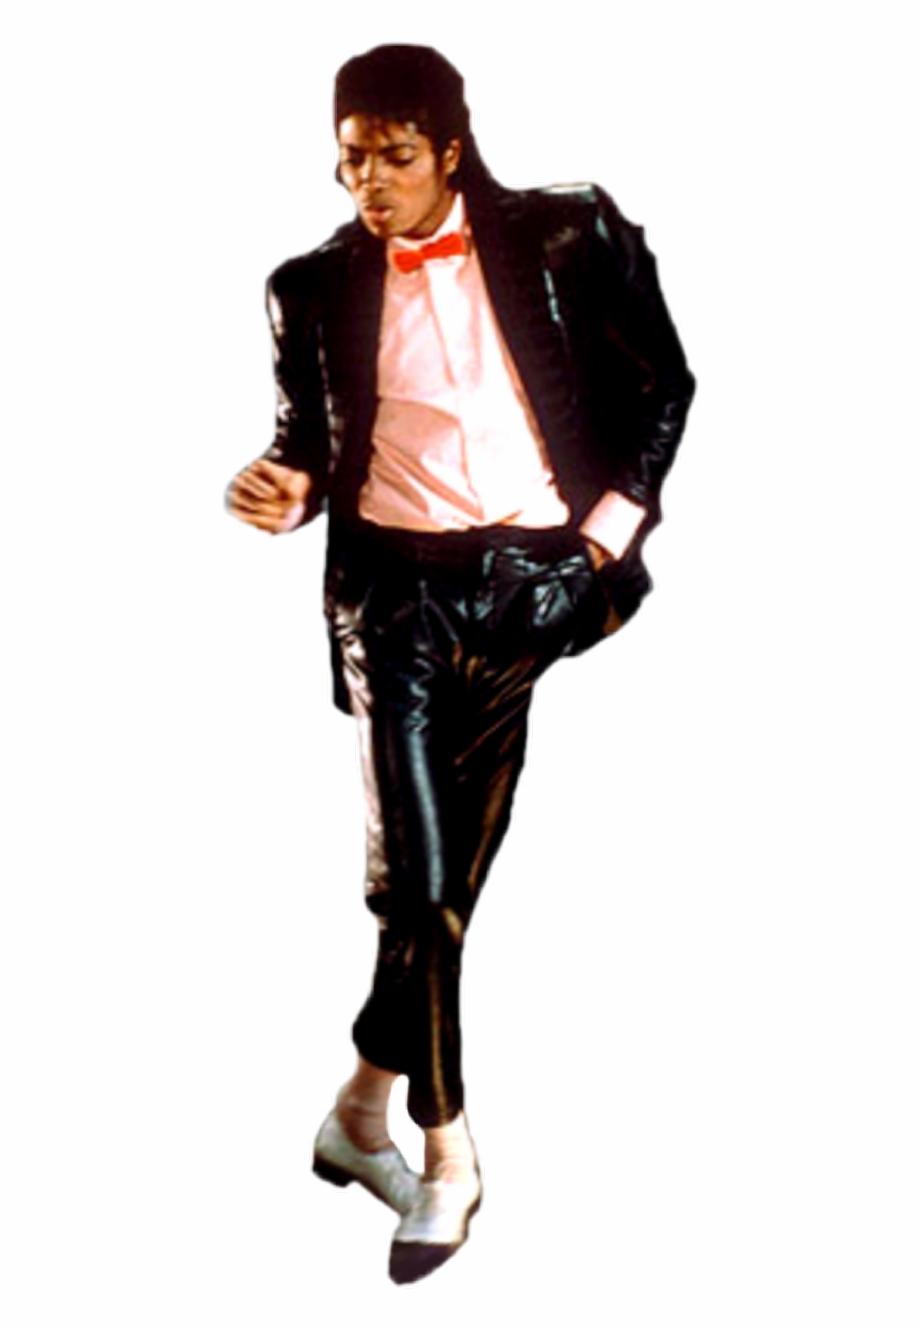 Michael Jackson Billie Jean Png Free PNG Images & Clipart.